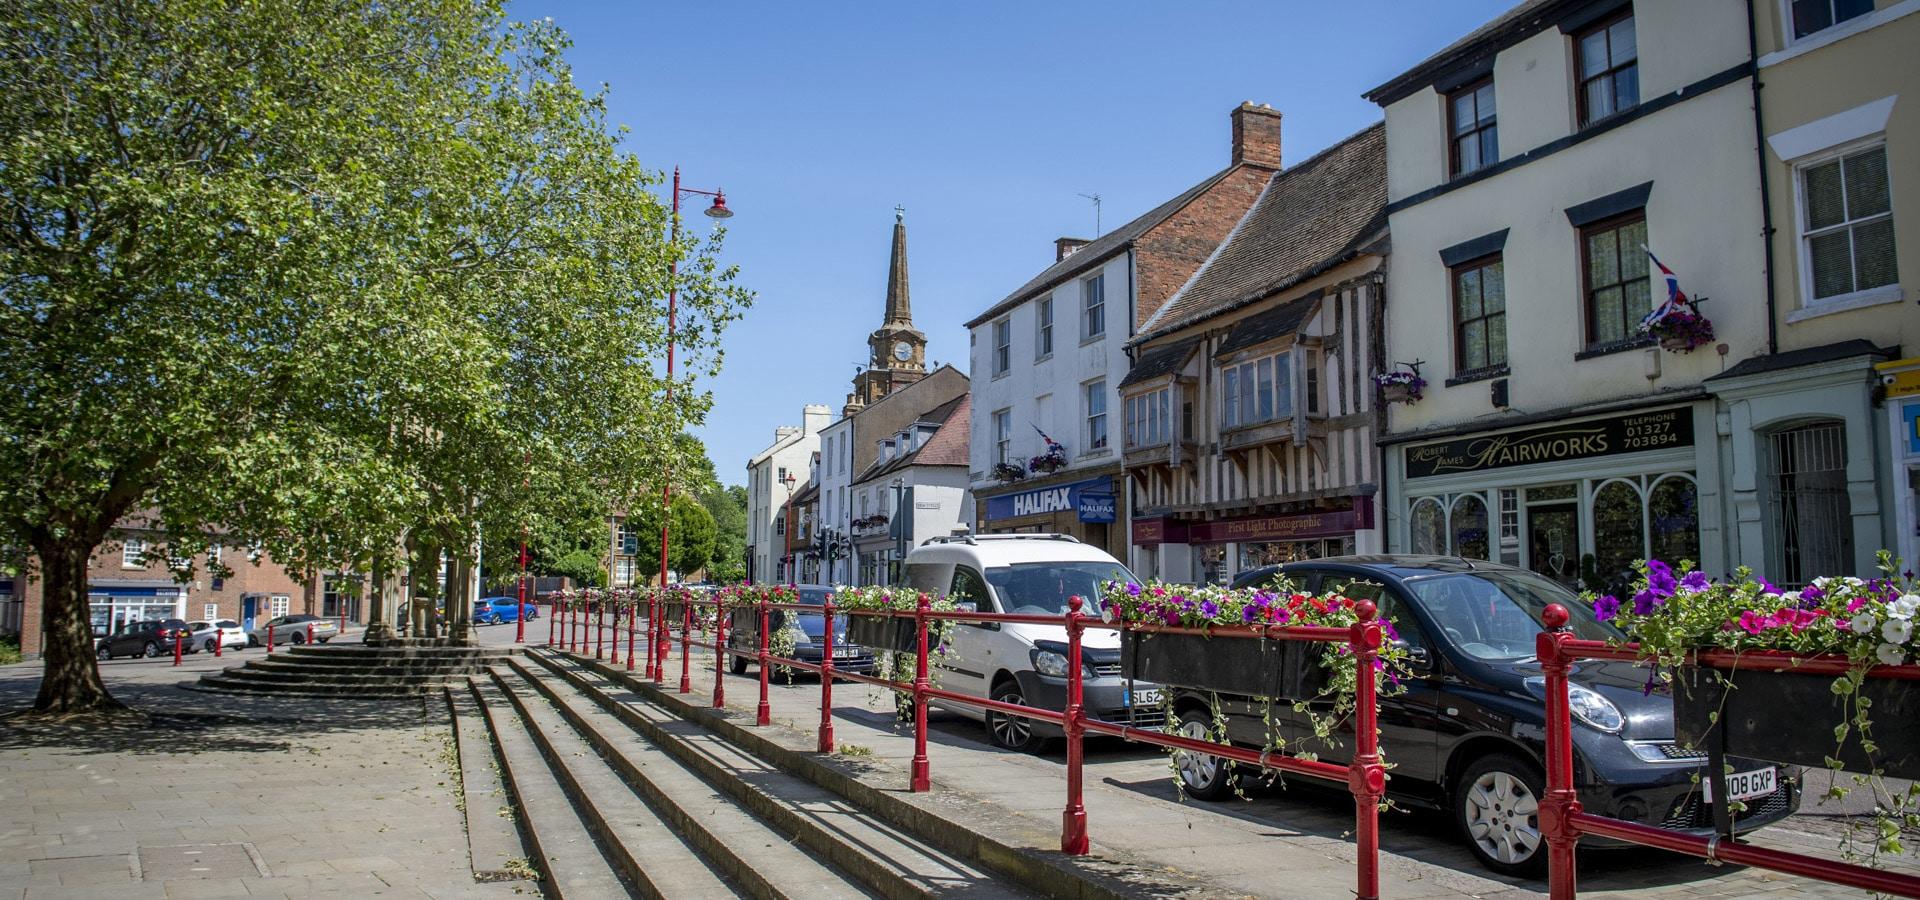 Daventry High Street Image